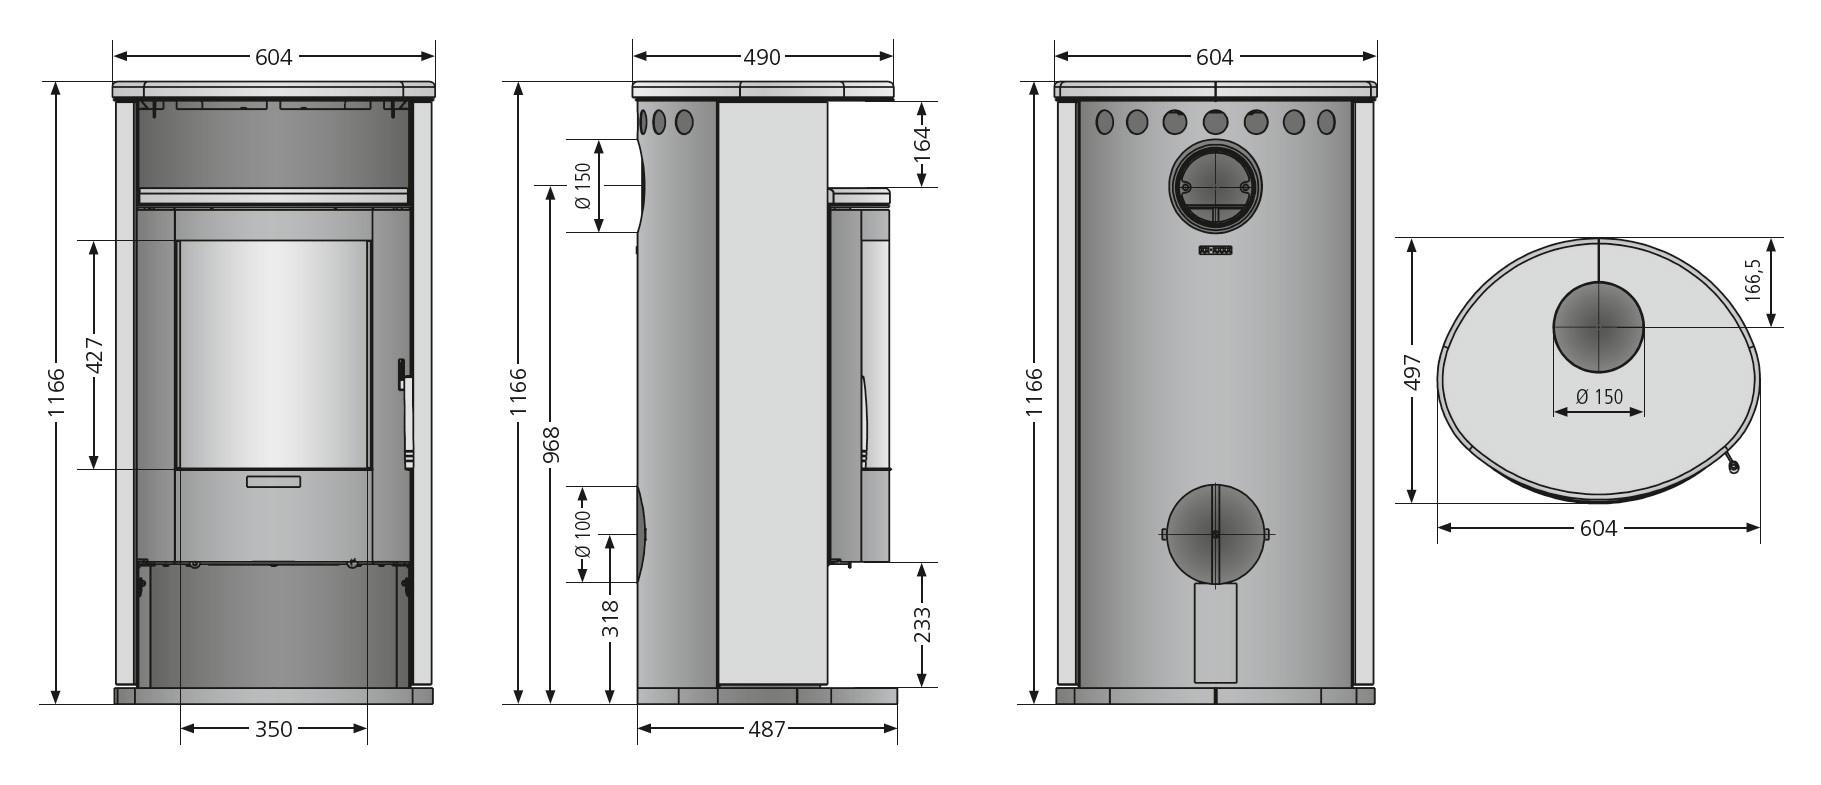 kaminofen justus island 7 ii raumluftunabh sandstein 6 5 kw bei. Black Bedroom Furniture Sets. Home Design Ideas